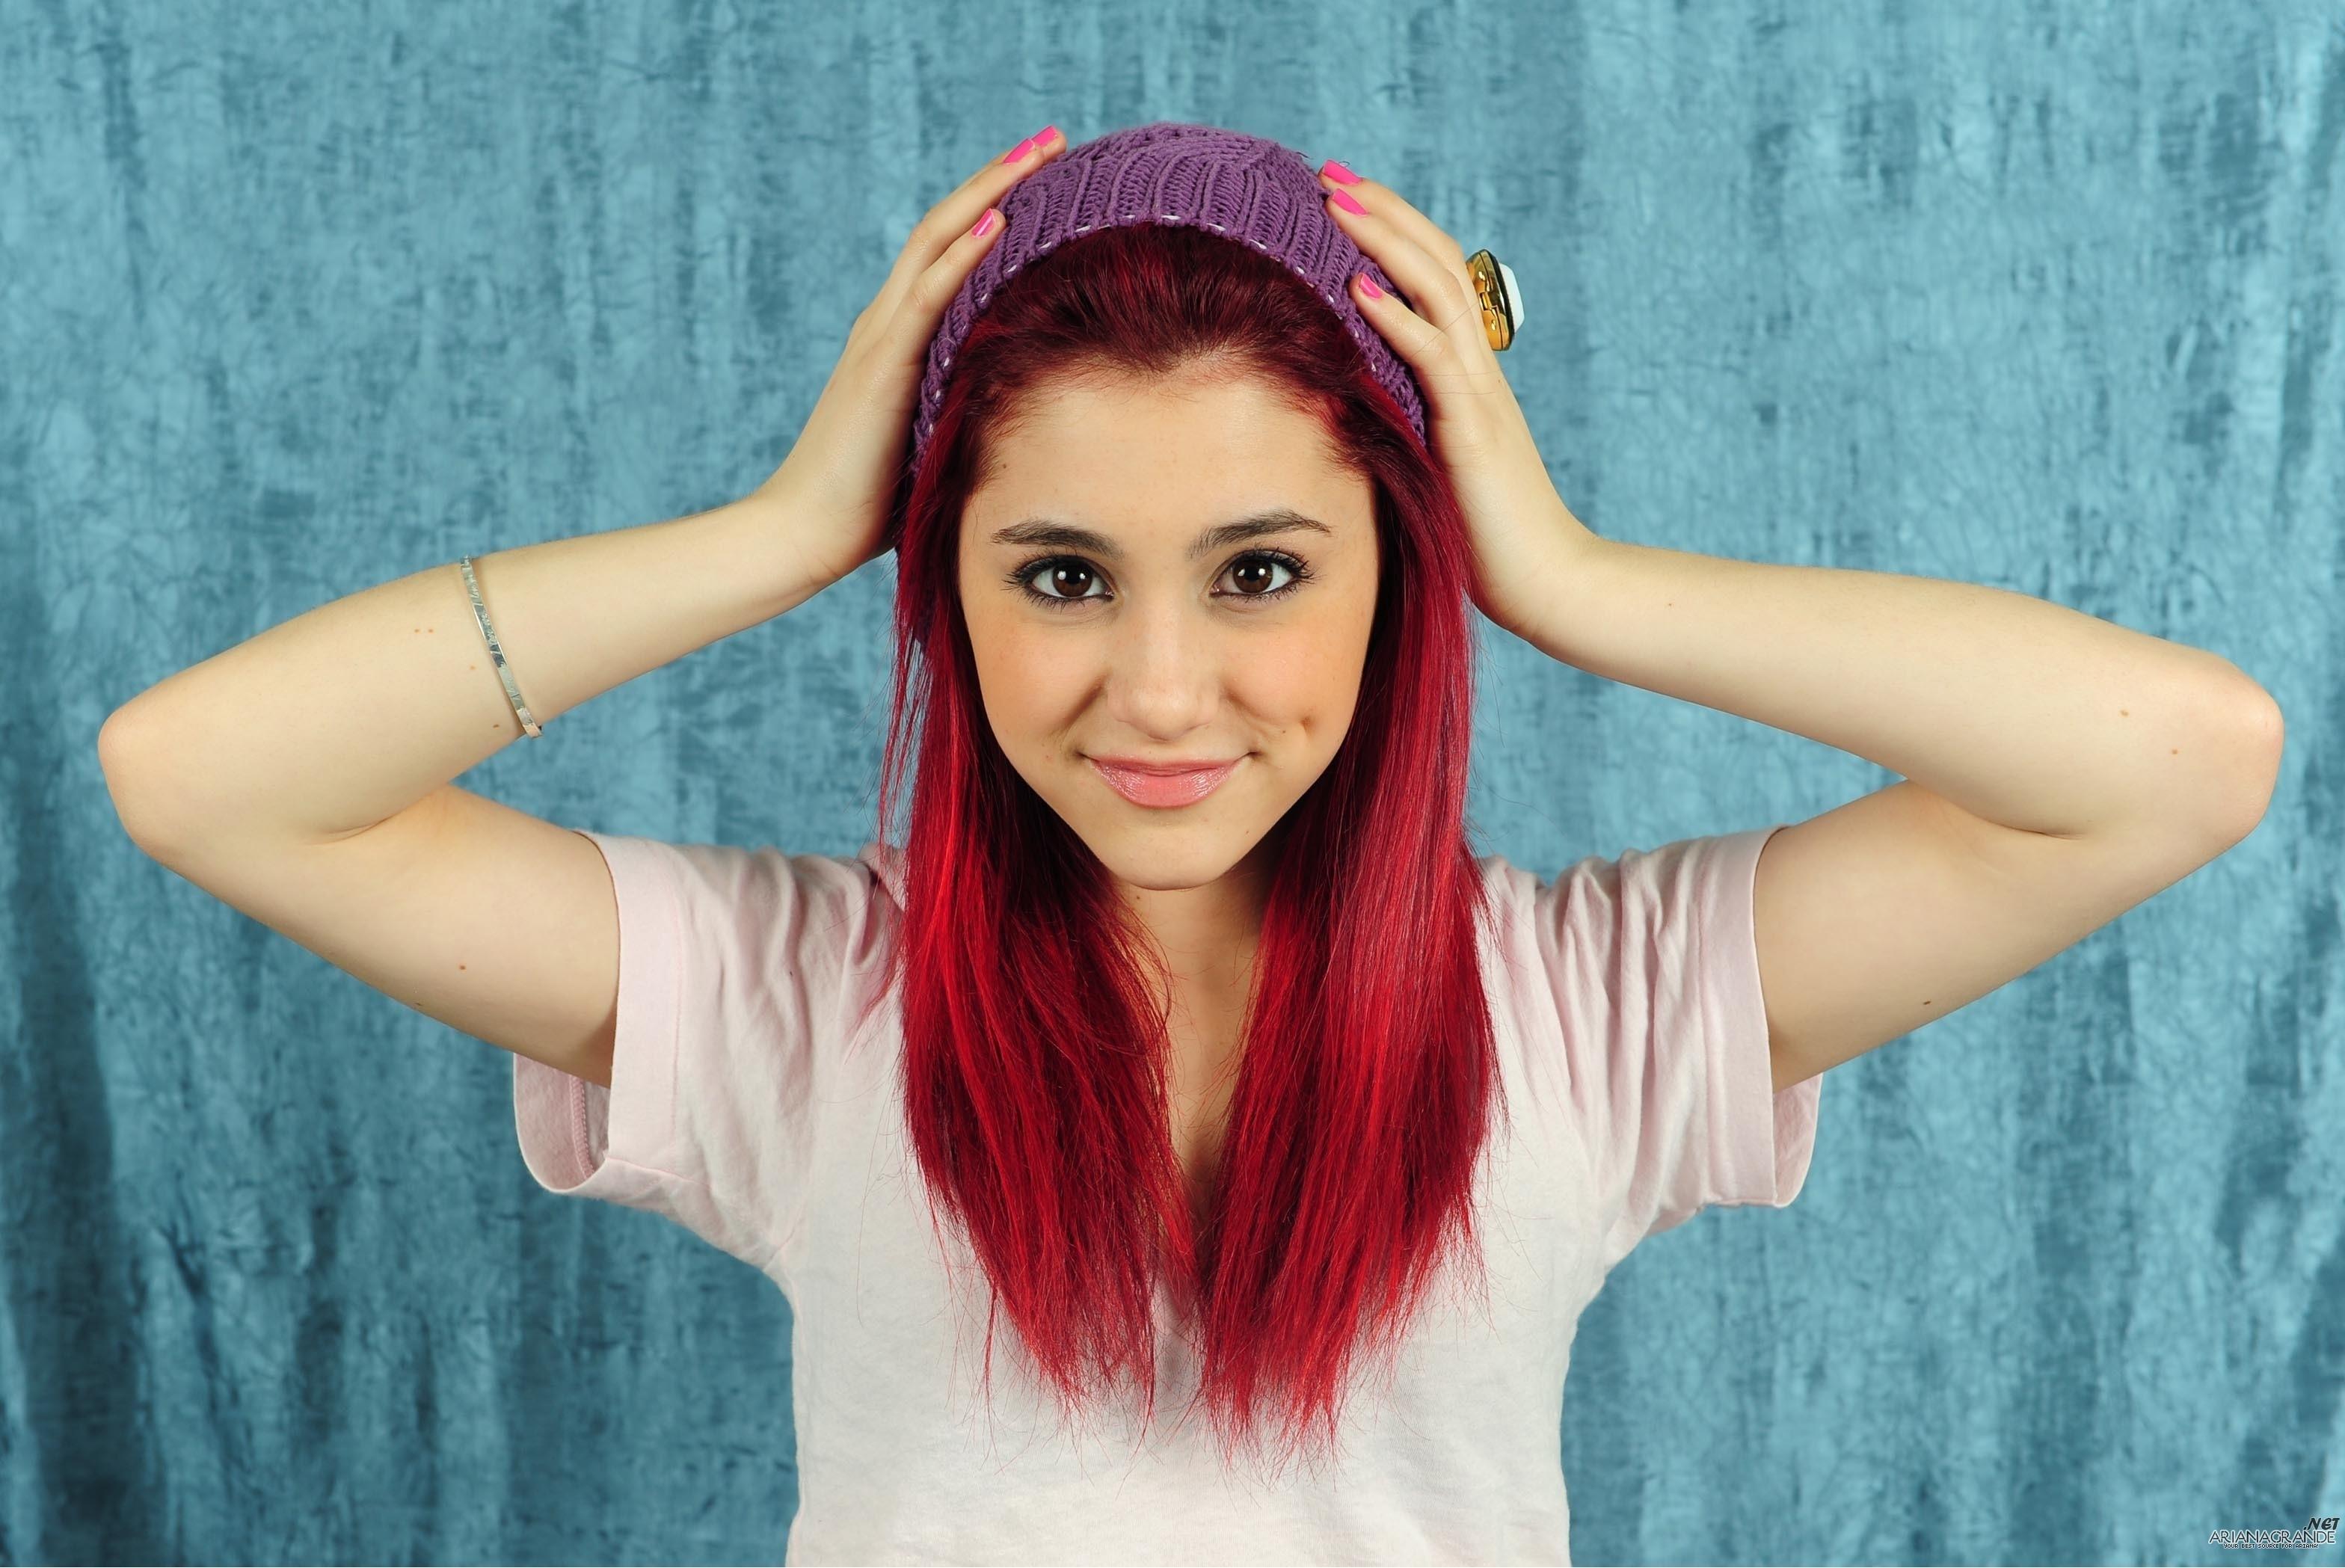 Ariana Grande -Imagenes-Ariana Grande